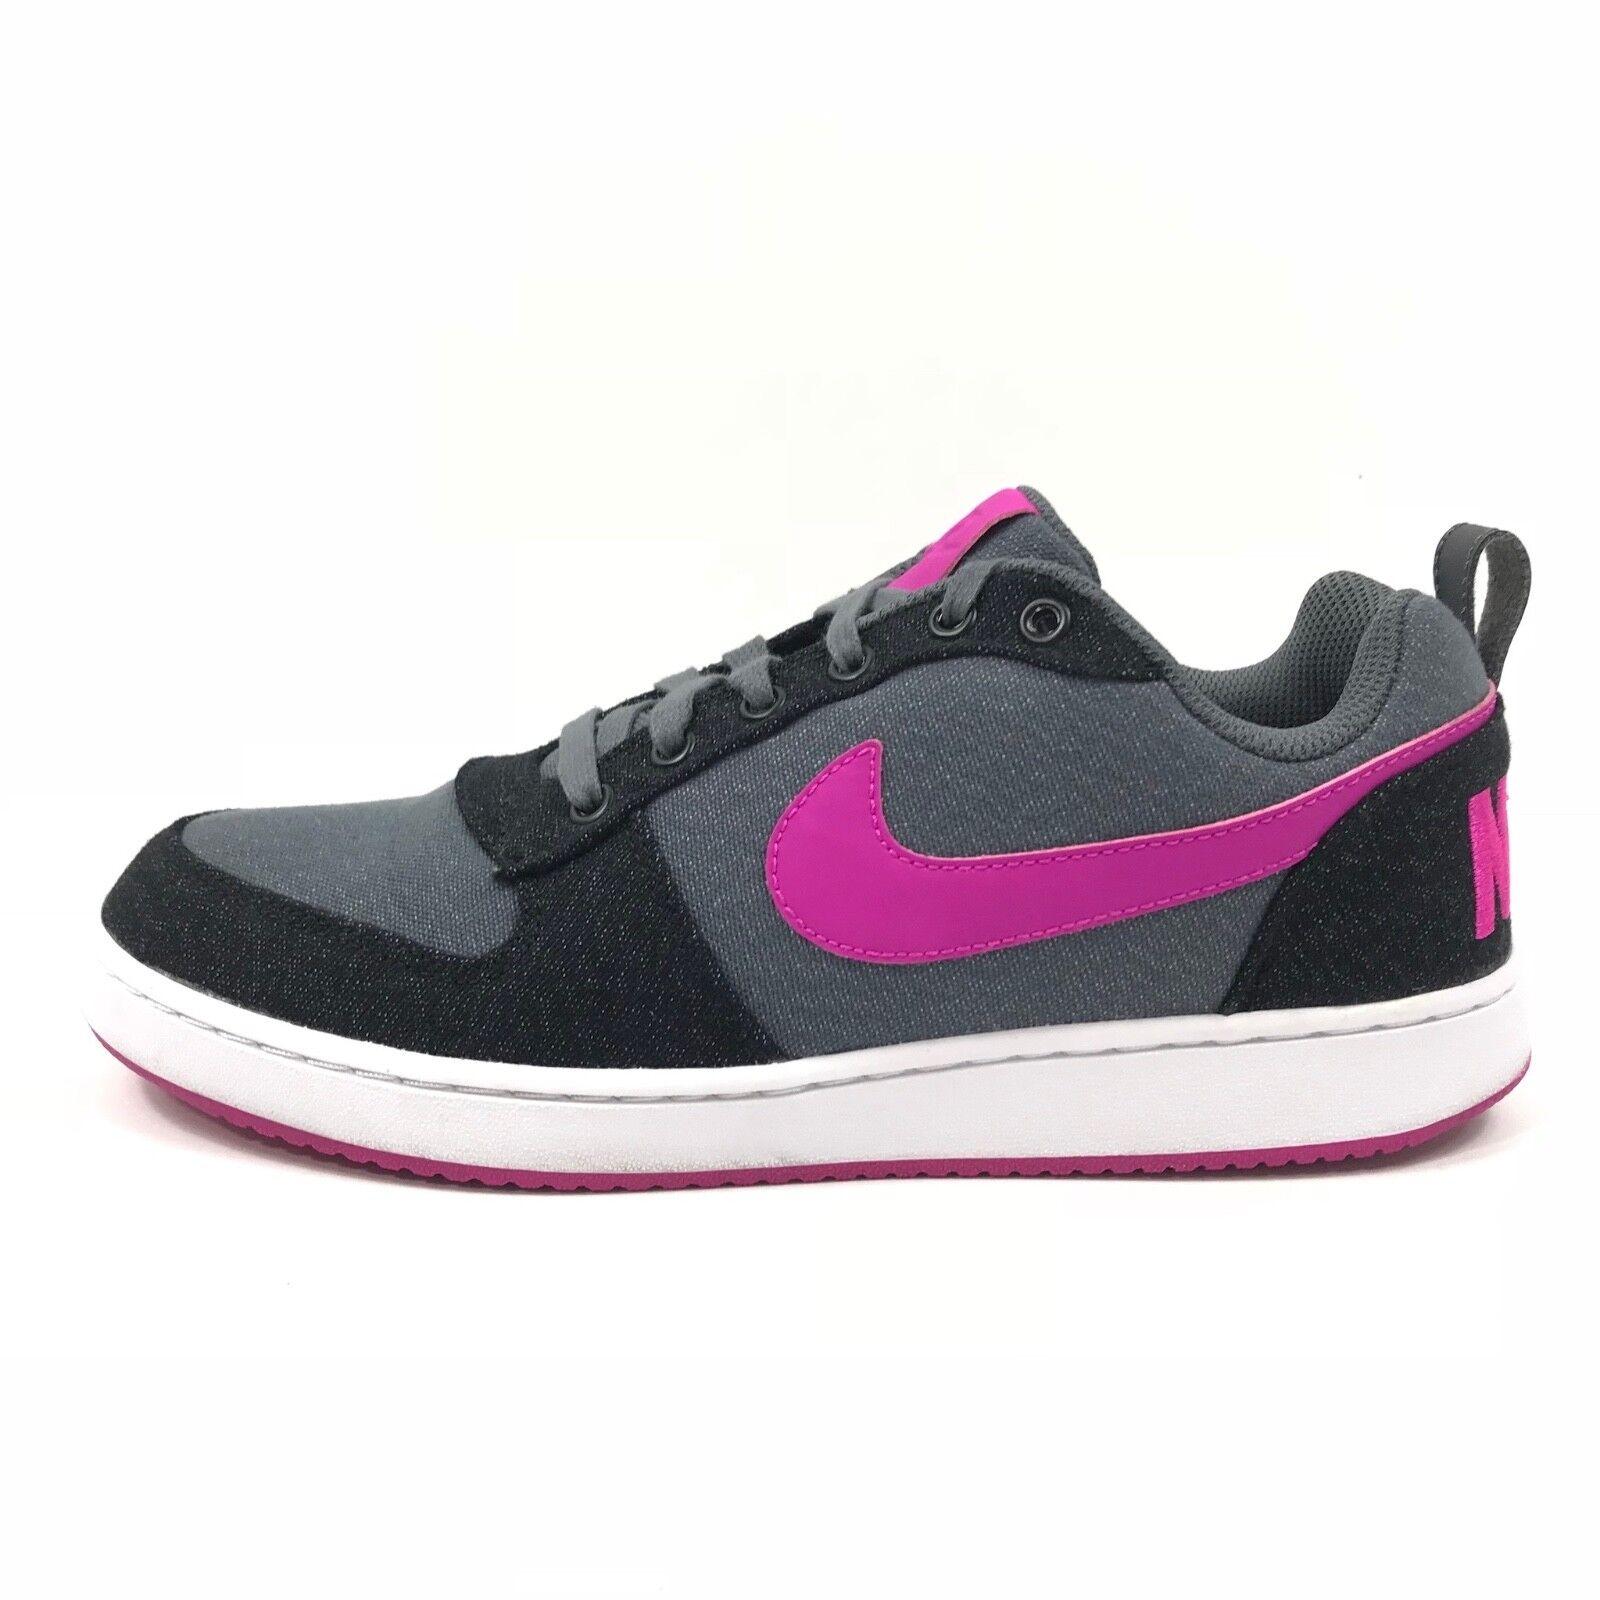 check out 579c3 2557c Nike WMNS Court Borough Low Premium Premium Premium Sneakers Gray Black  Pink Sz 9.5 861533-